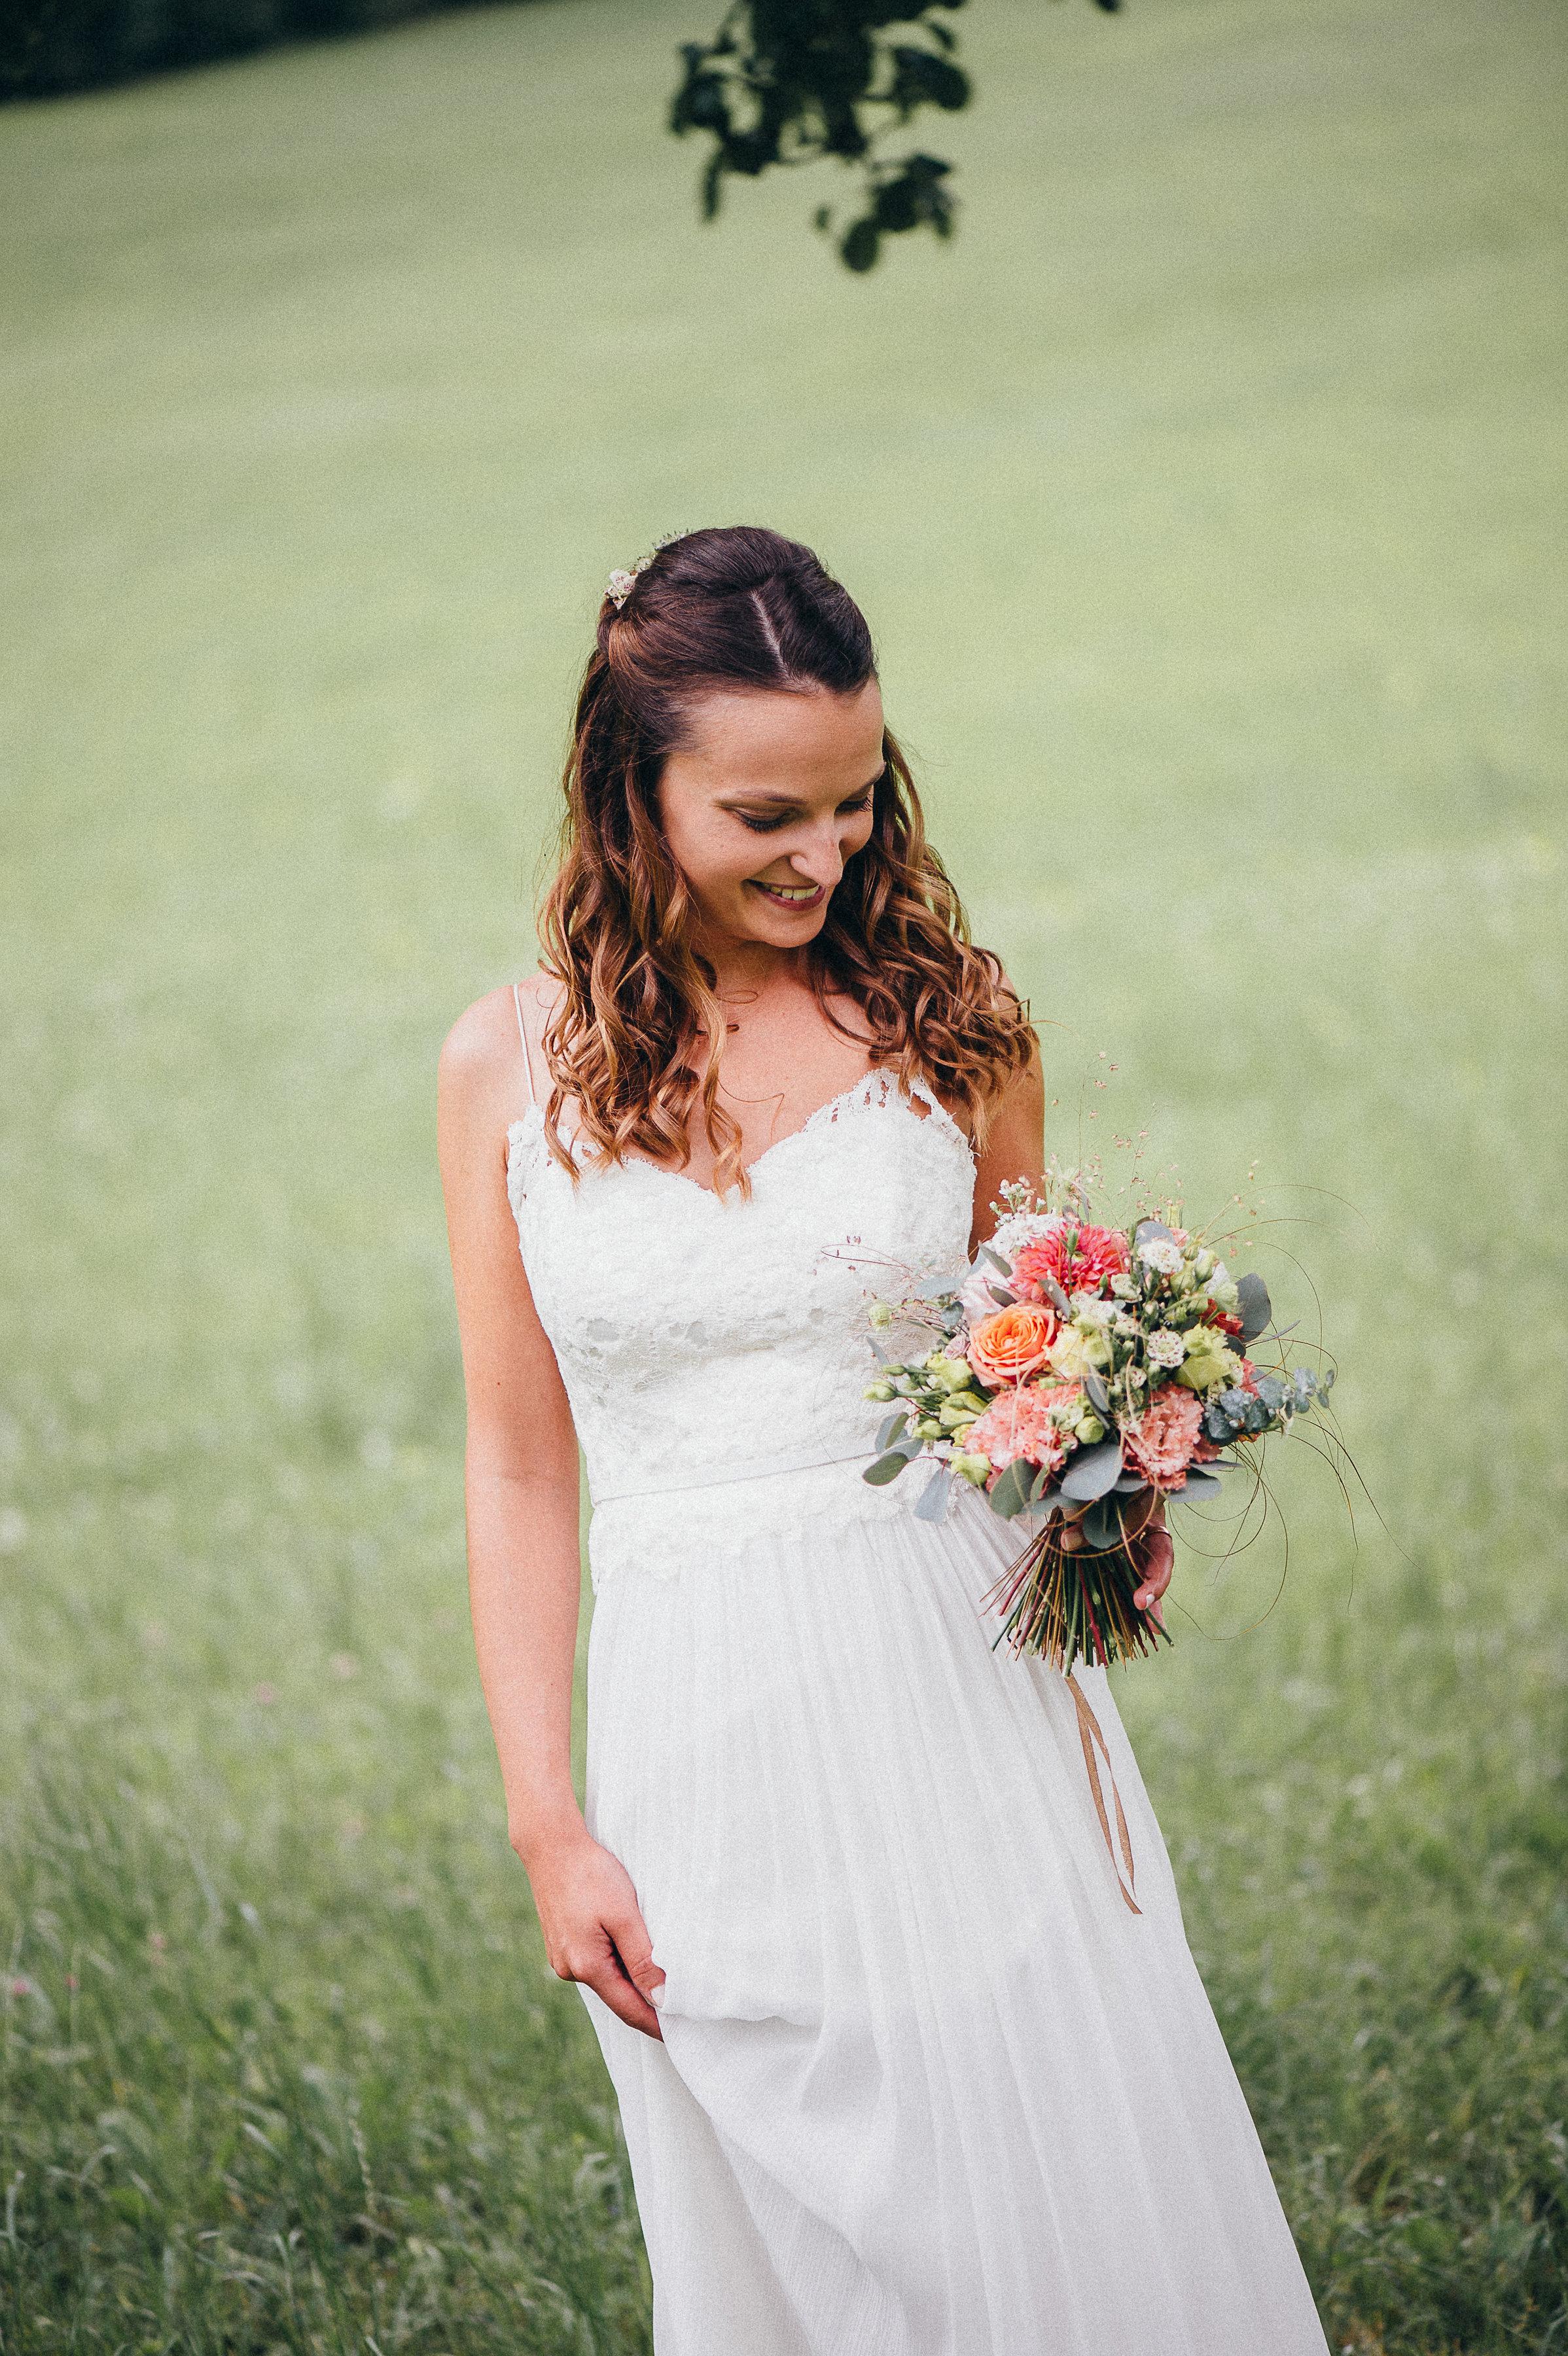 Hochzeitsfotografin Bettina Kogler